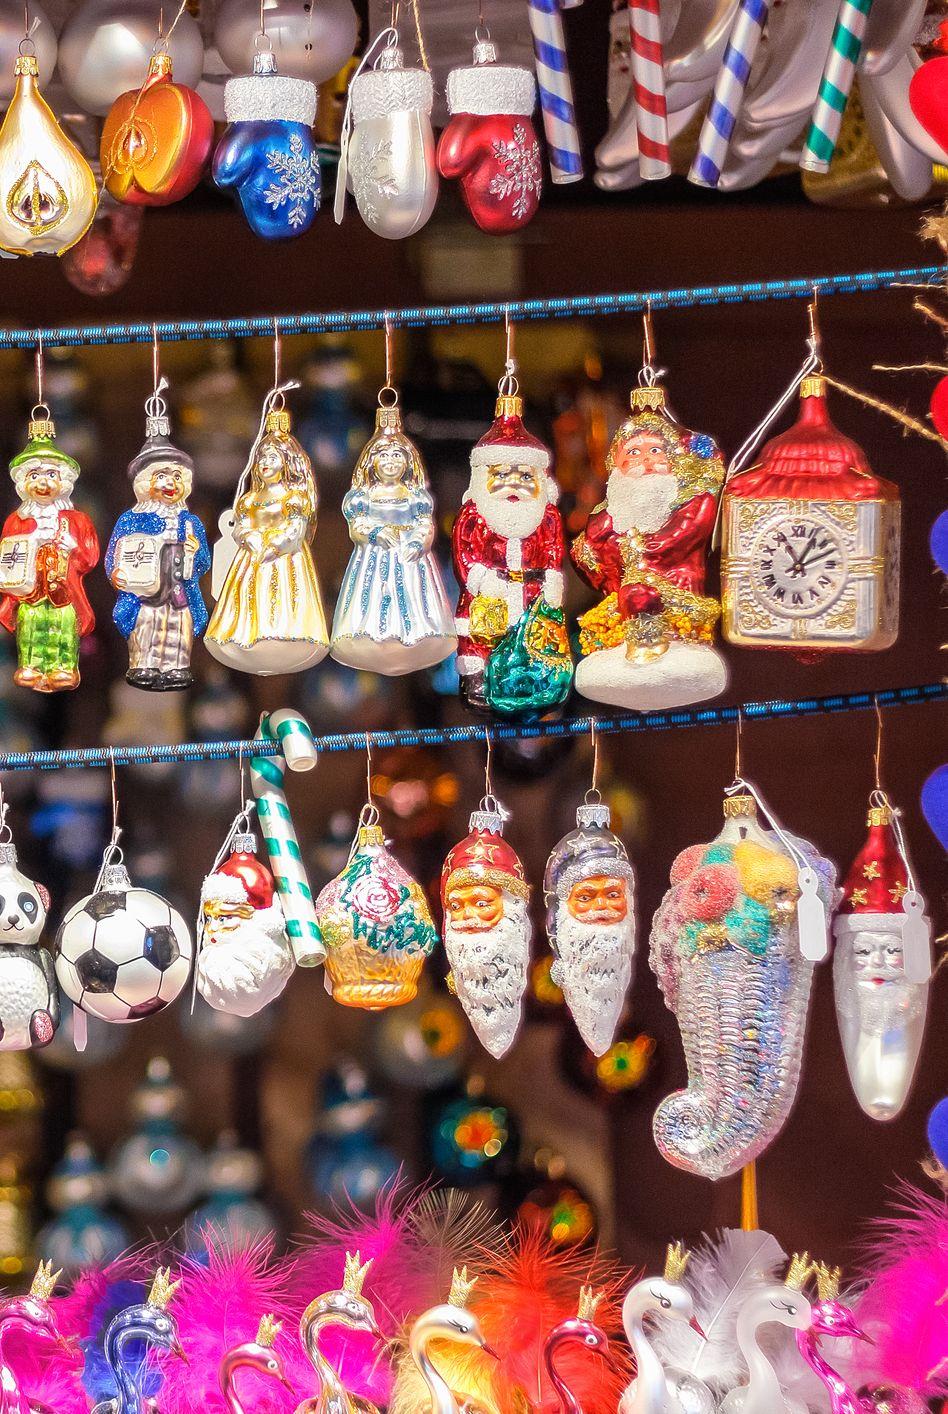 Christmas tree ornaments on display at Christmas market